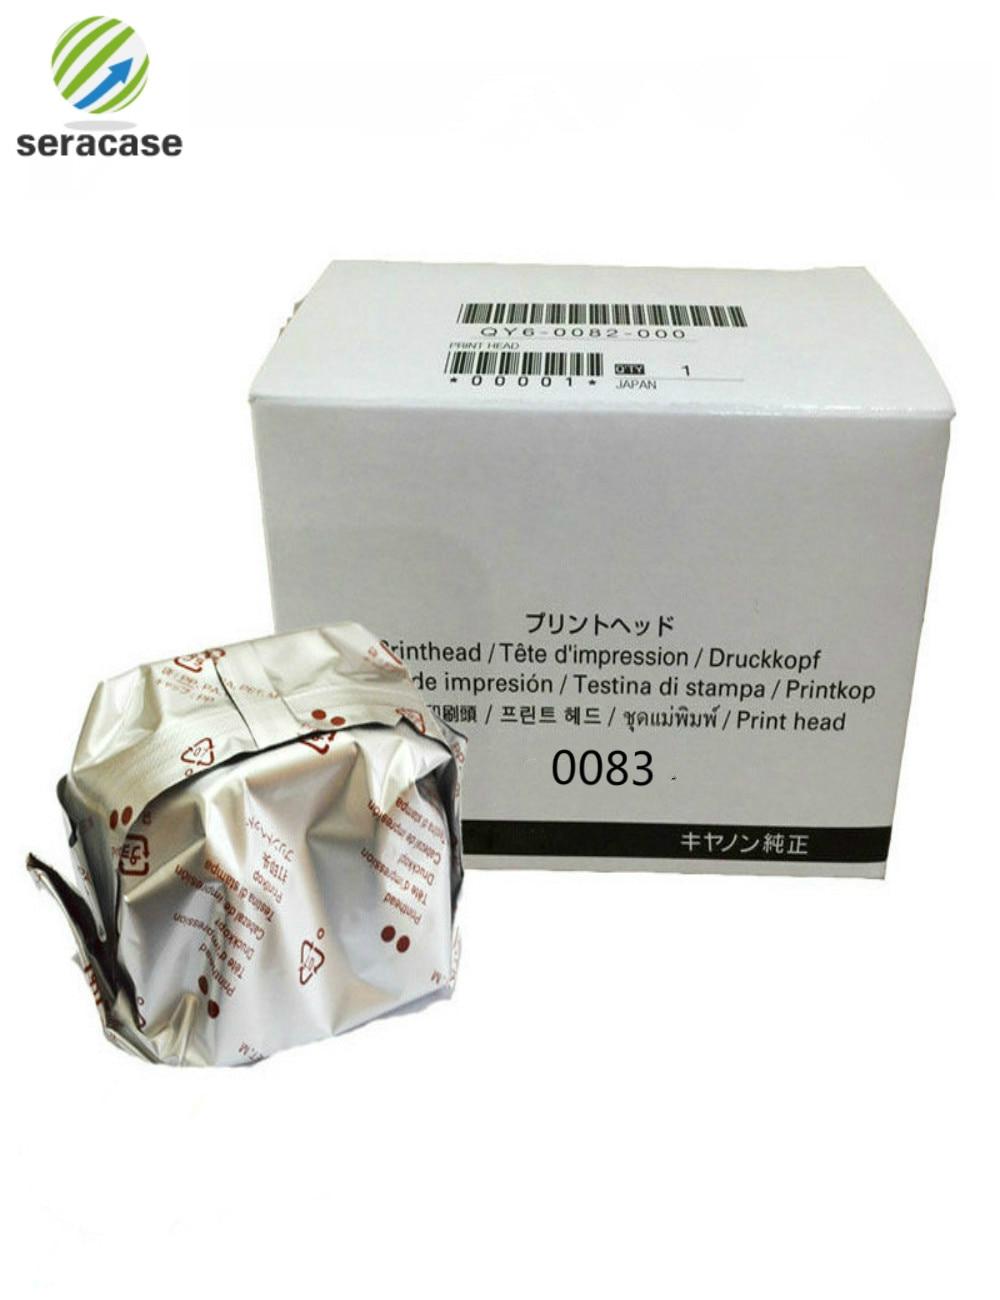 Original QY6-0083 Printhead Print Head For Canon MG6310 MG6320 MG6350 MG6380 MG7120 MG7150 MG7180 IP8720 IP8750 IP8780 MG7140